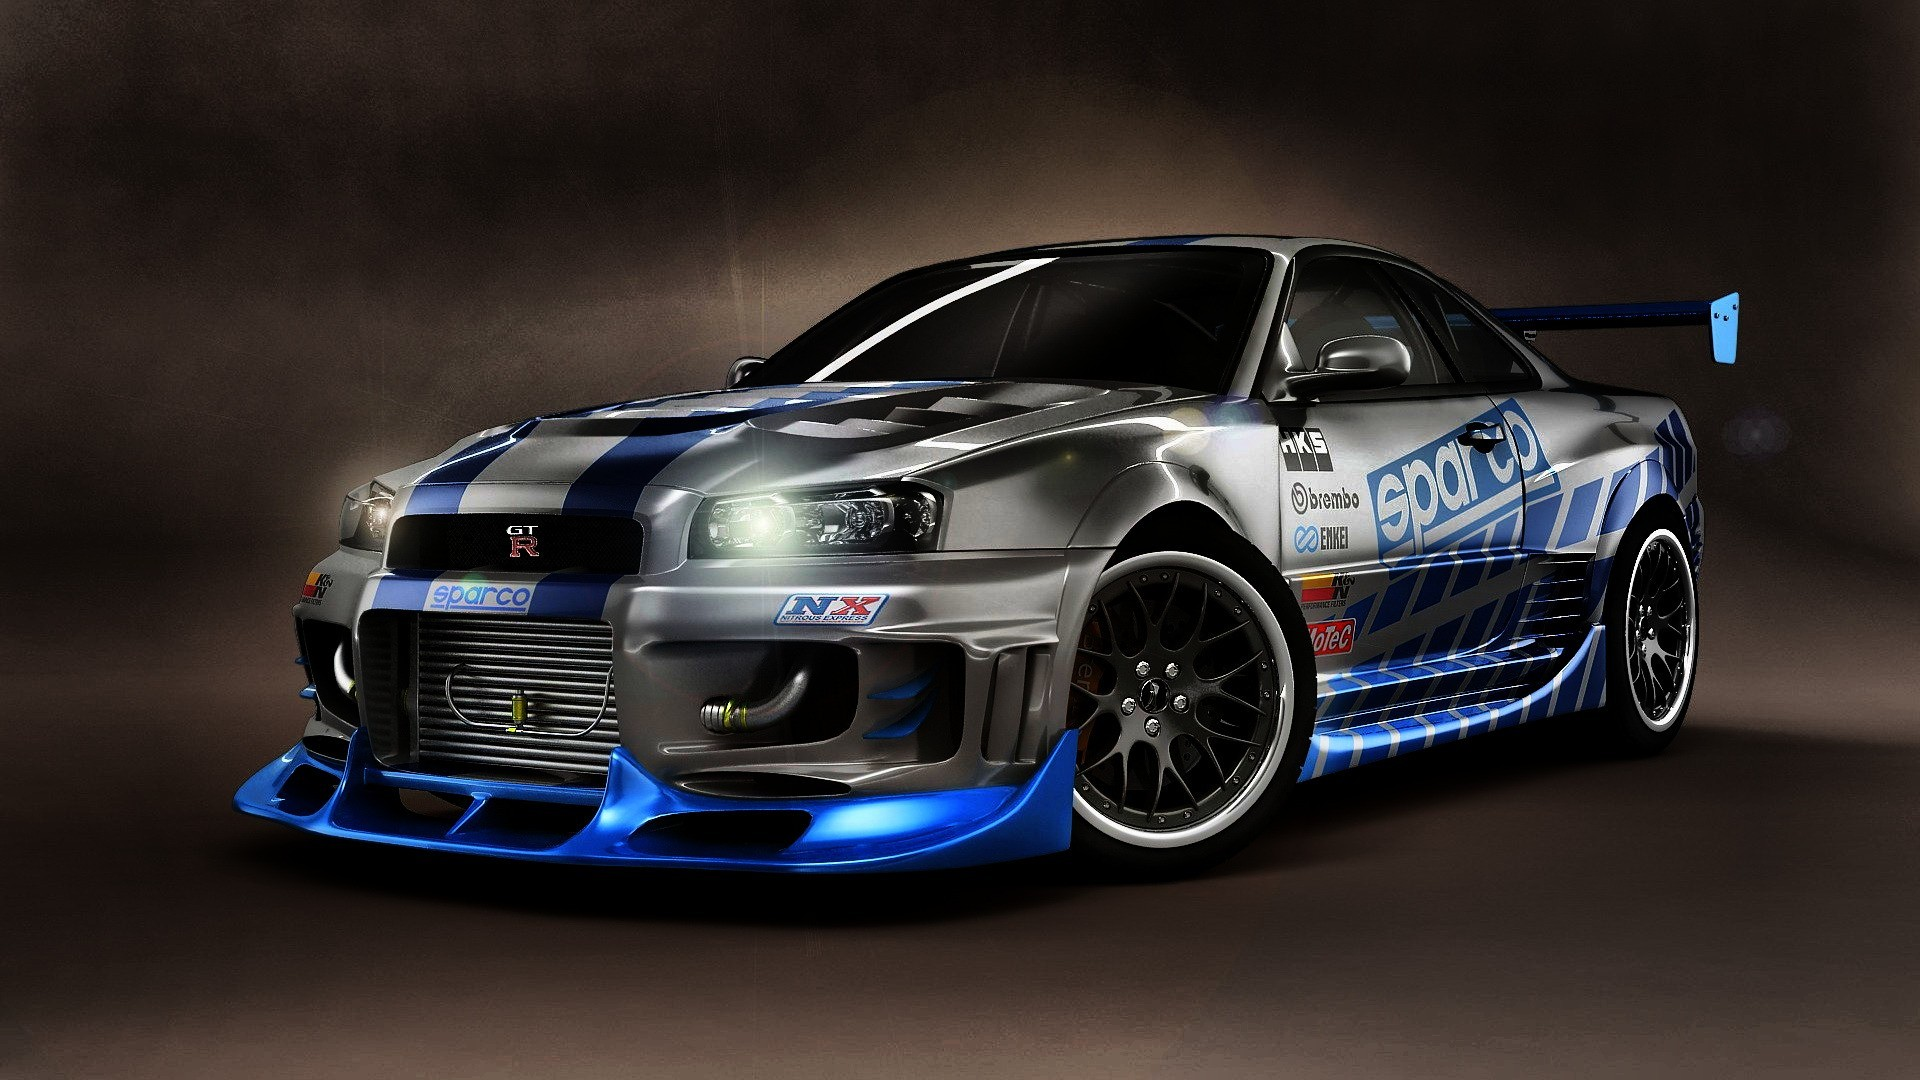 General 1920x1080 Nissan Skyline GT-R Nissan Skyline GT-R R34 car vehicle silver cars Nissan